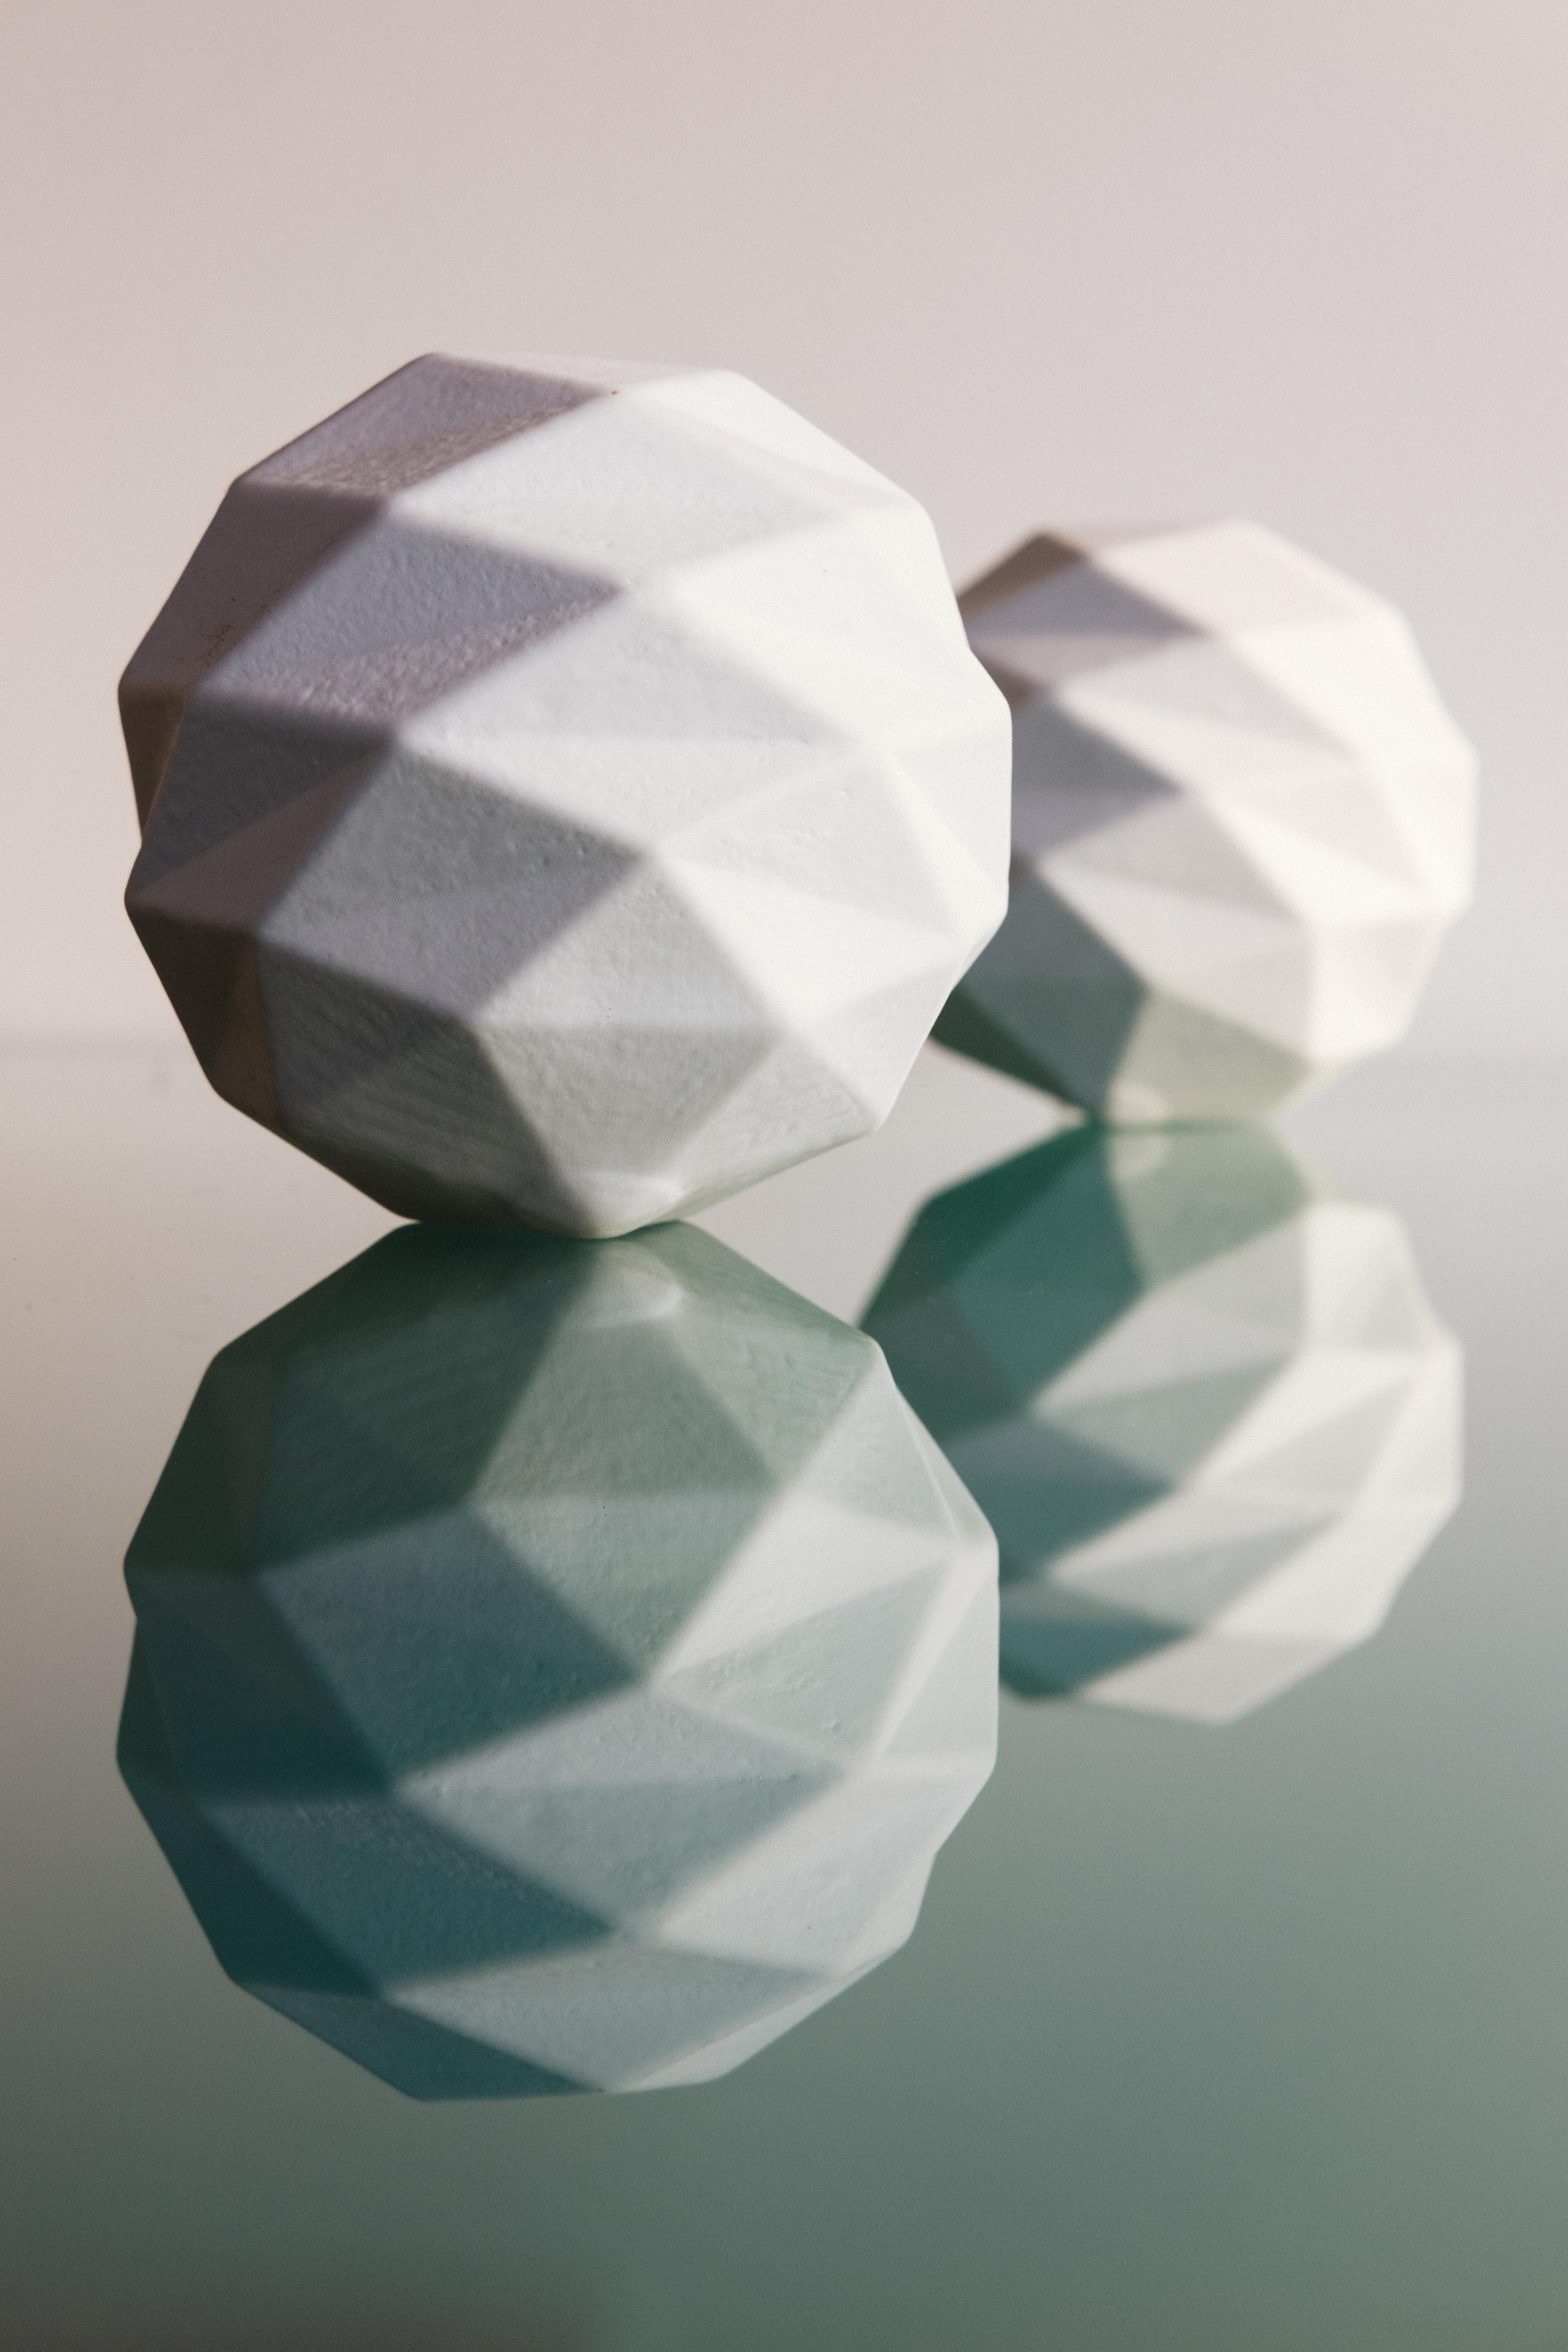 ALM_Jessie Lee_Geometric Shape_1528.jpg